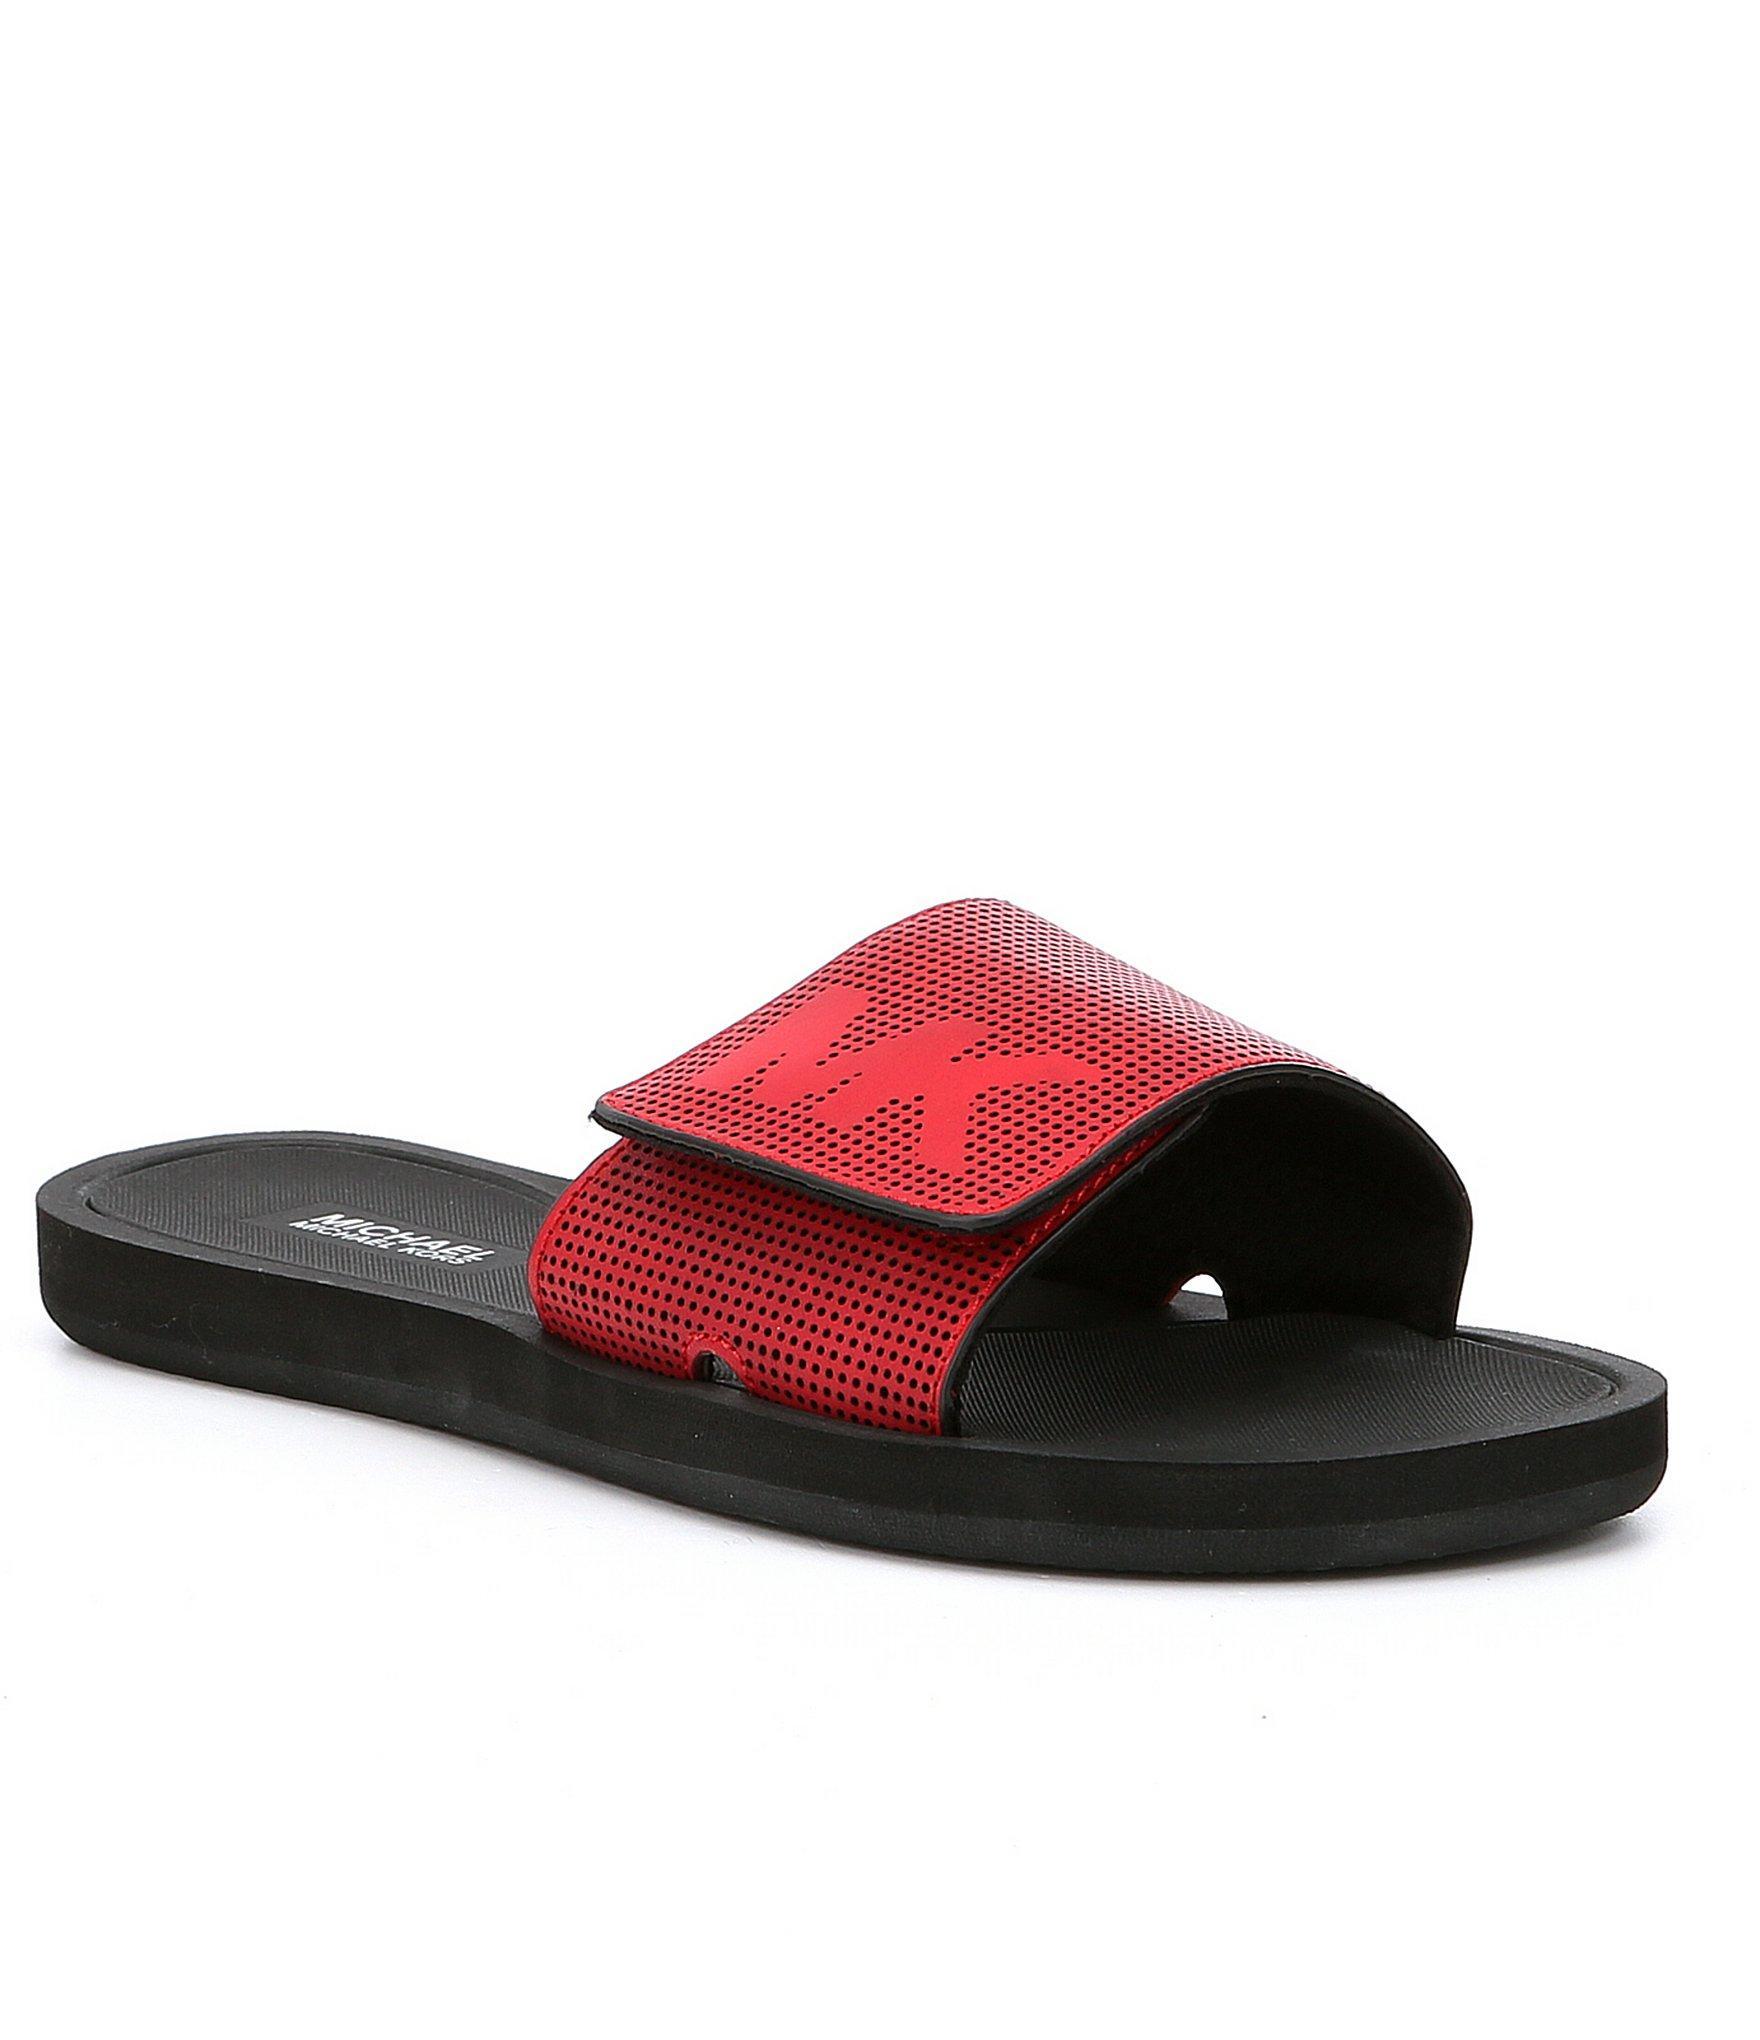 Lyst Michael Michael Kors Mk Slides Sandals In Red